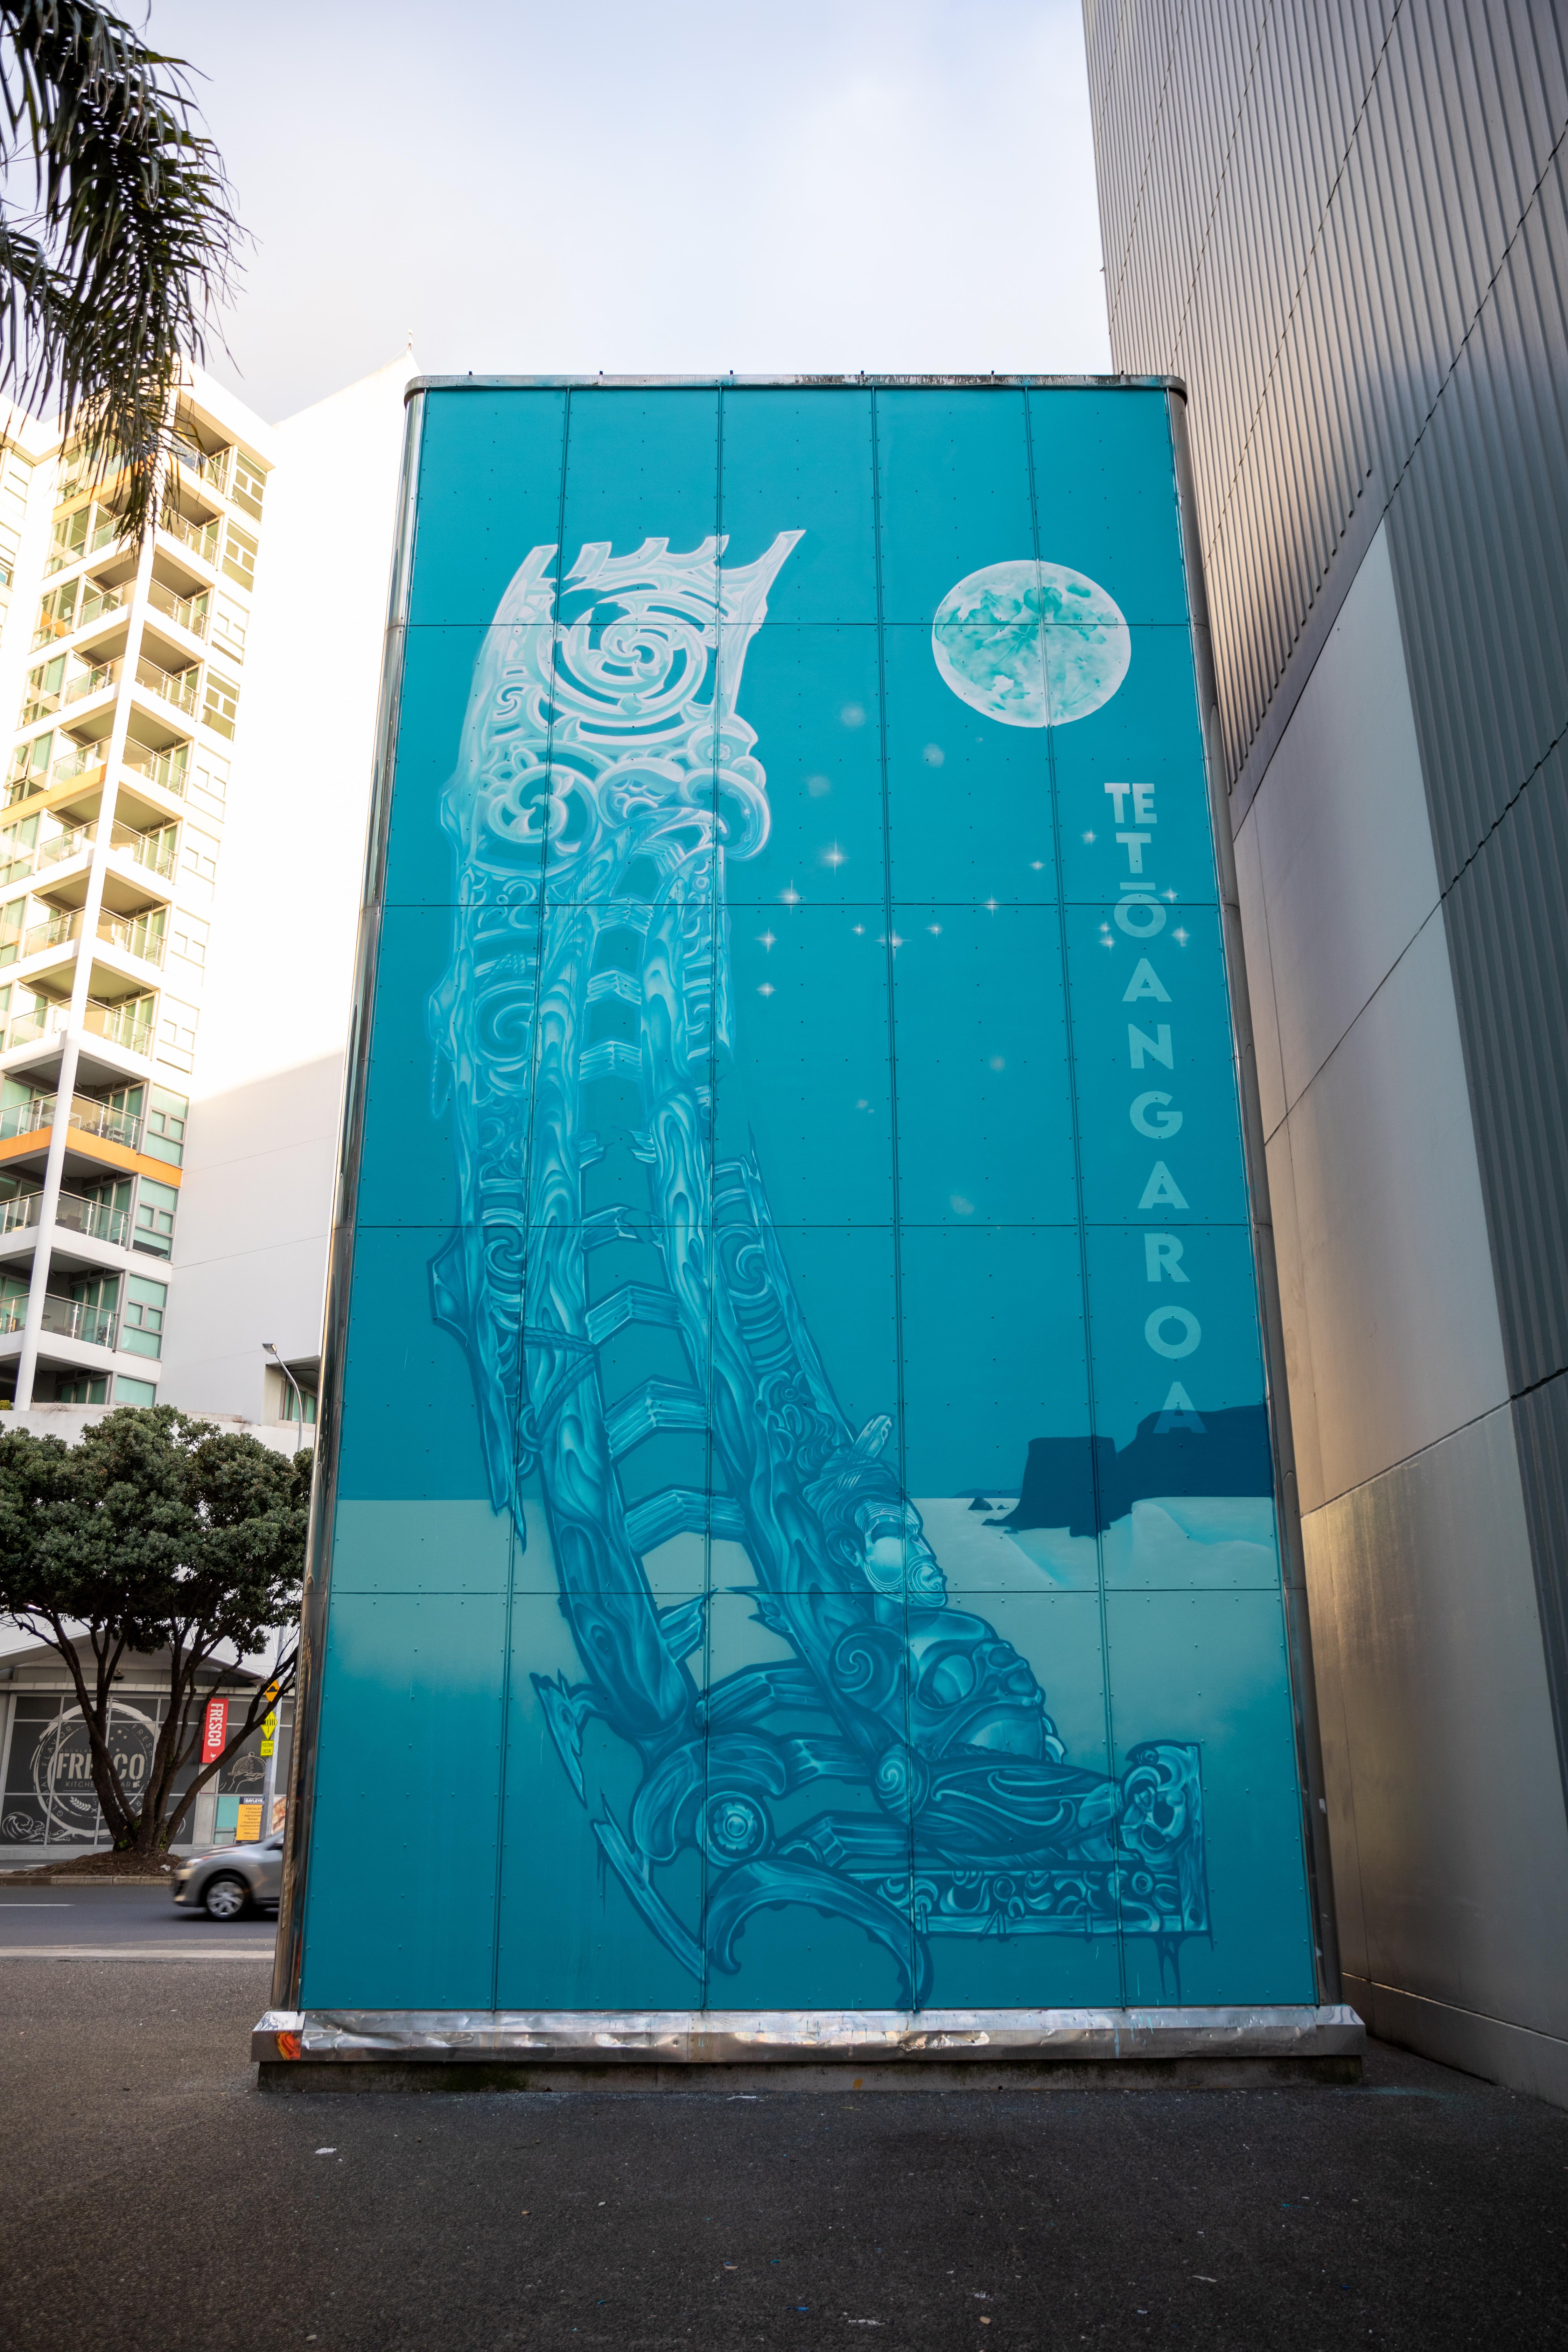 https://rfacdn.nz/corporate/assets/media/the-second-ngati-whatua-orakei-panel-painted-by-poi-hana.jpg